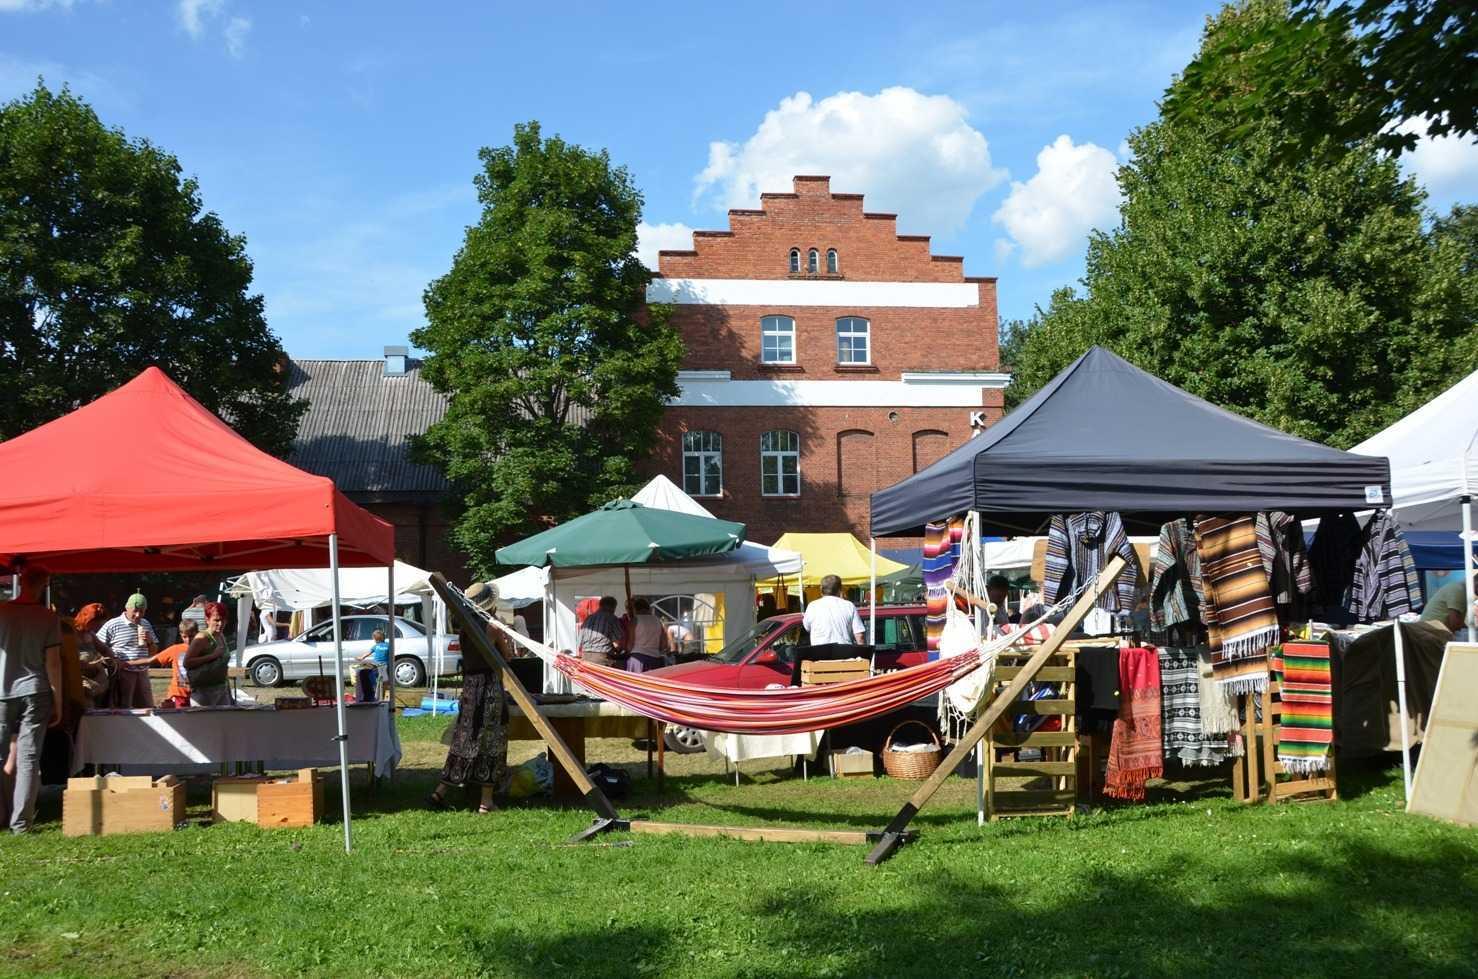 Viljandi halk pazarı…